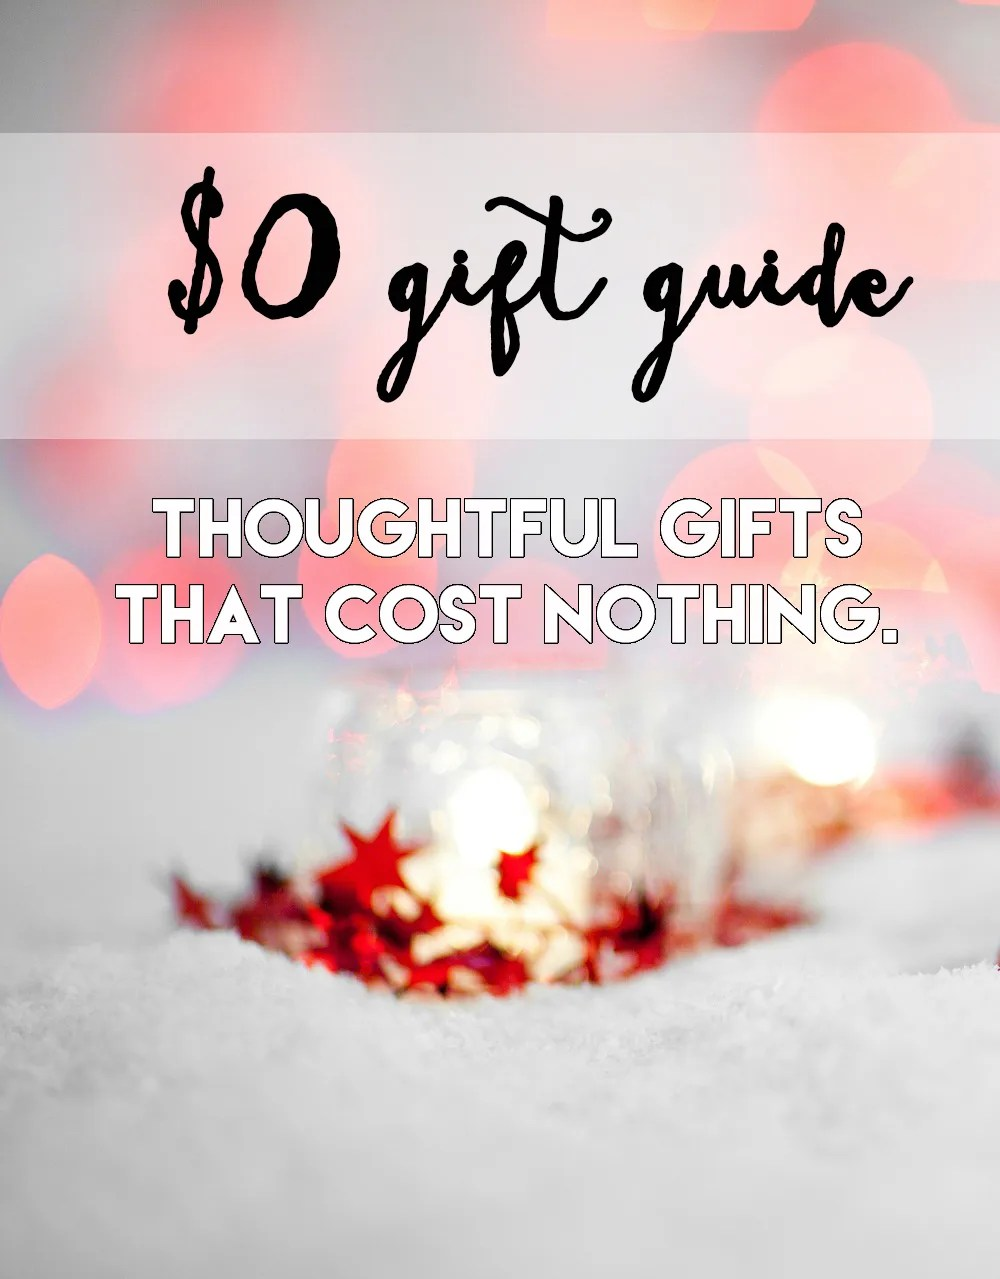 $0 gift guide // stephanieorefice.net